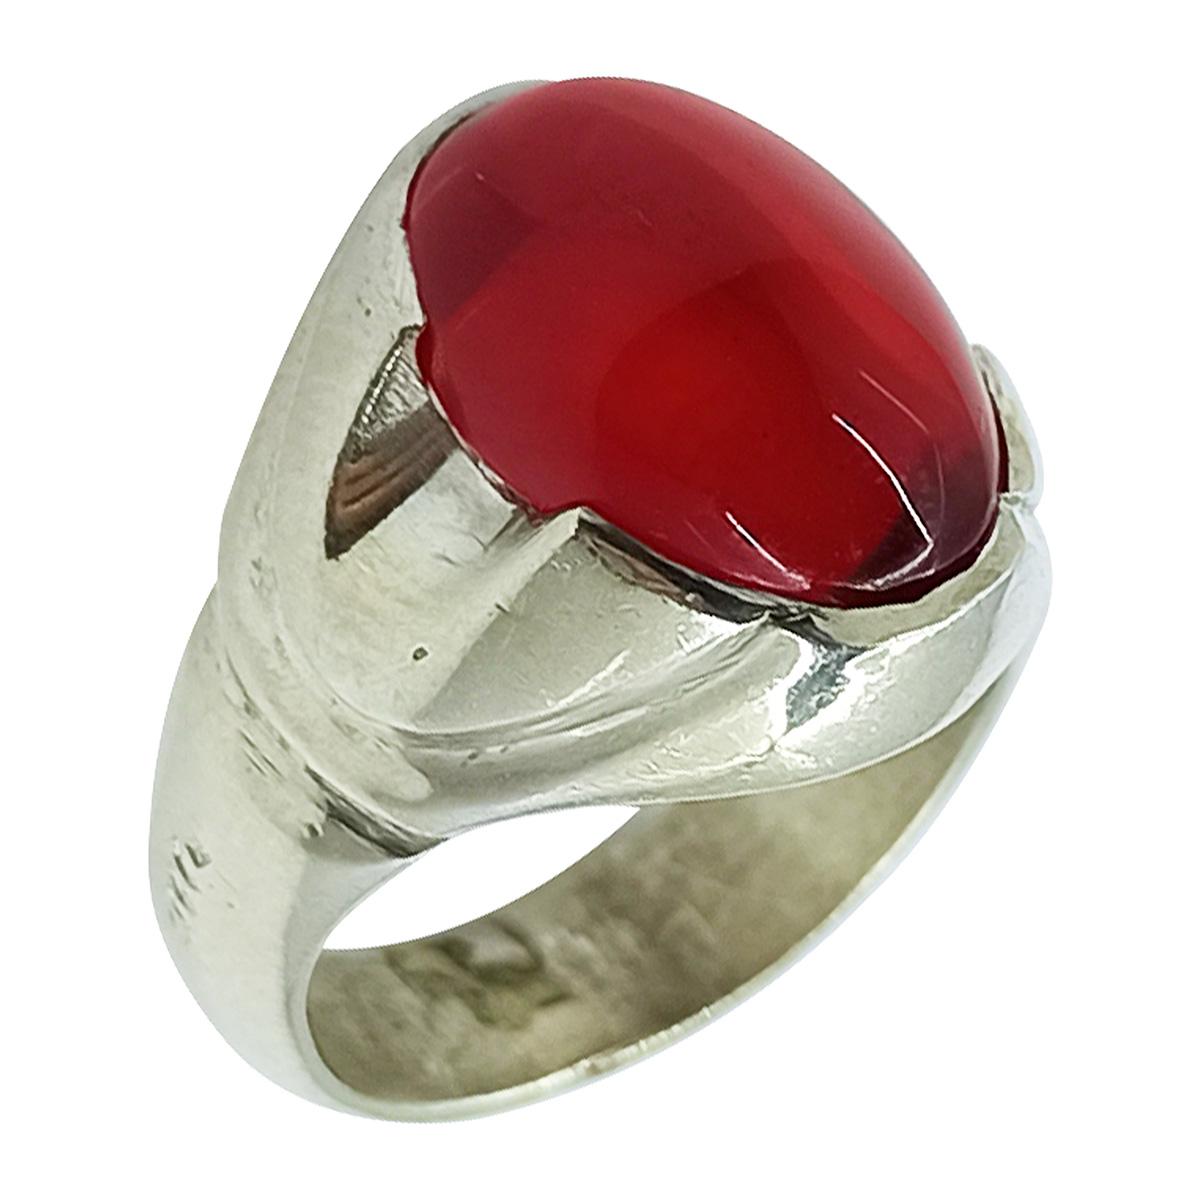 انگشتر نقره مردانه سلین کالا مدل یاقوت سرخ کد ce-As12